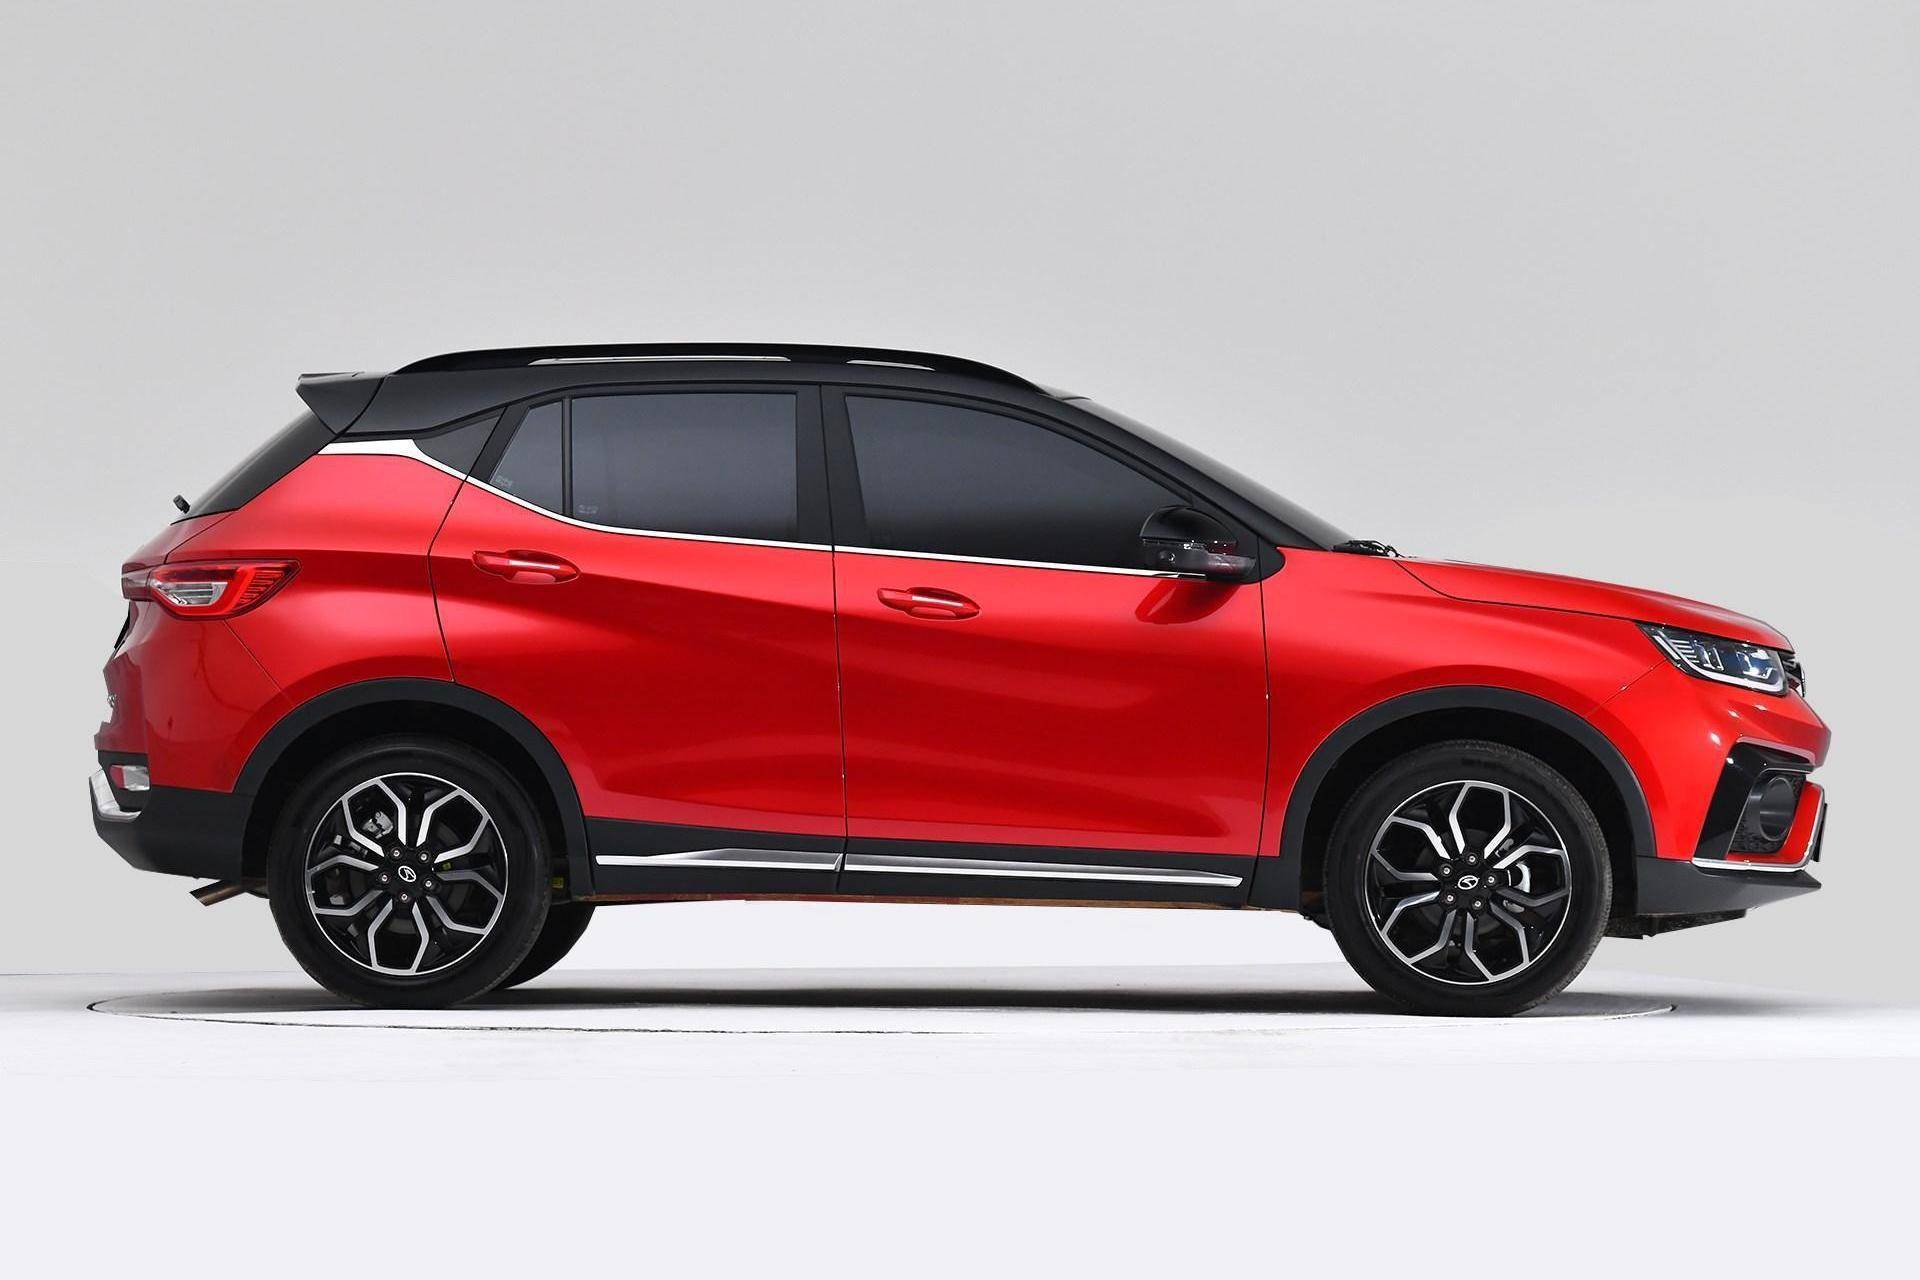 DX5宛若奔驰AMG,4.4米新小型SUV,这油耗敢买吗?